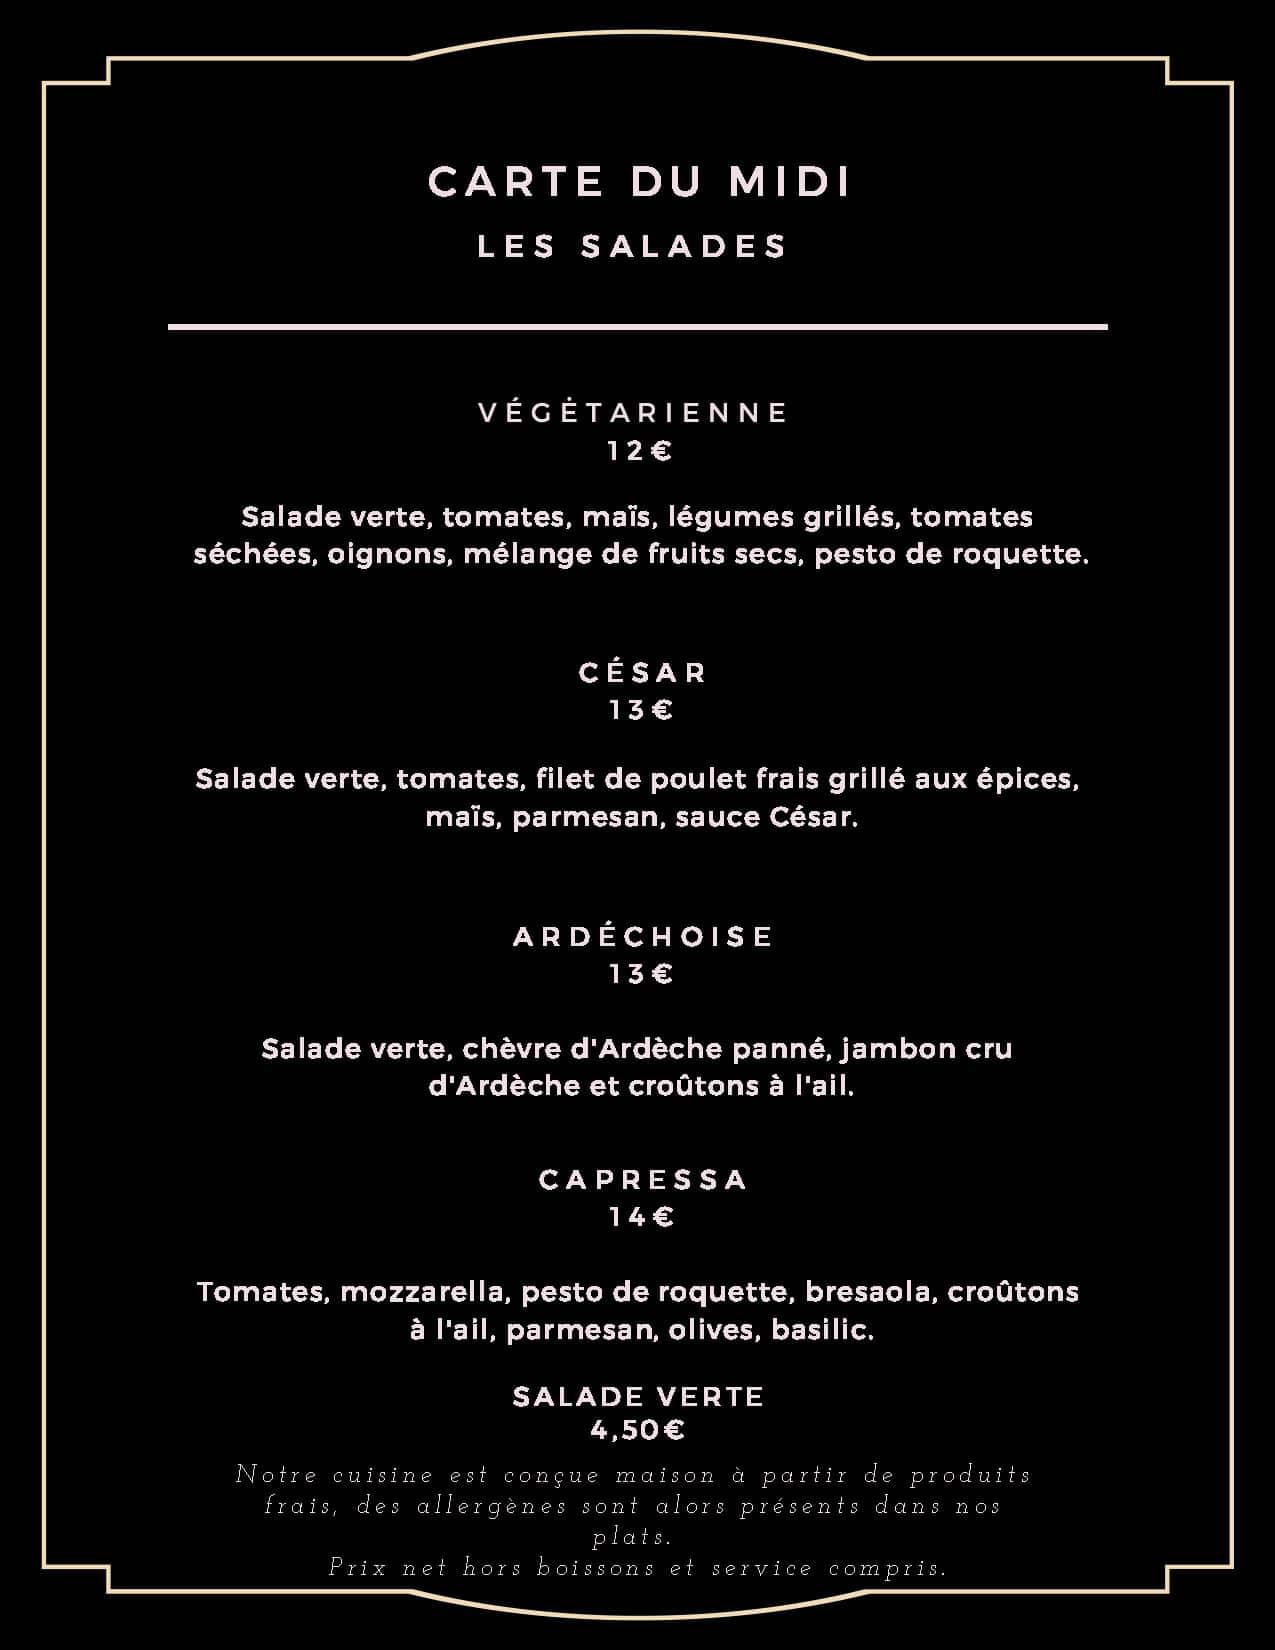 carte du midi salades - carte-du-midi-salades